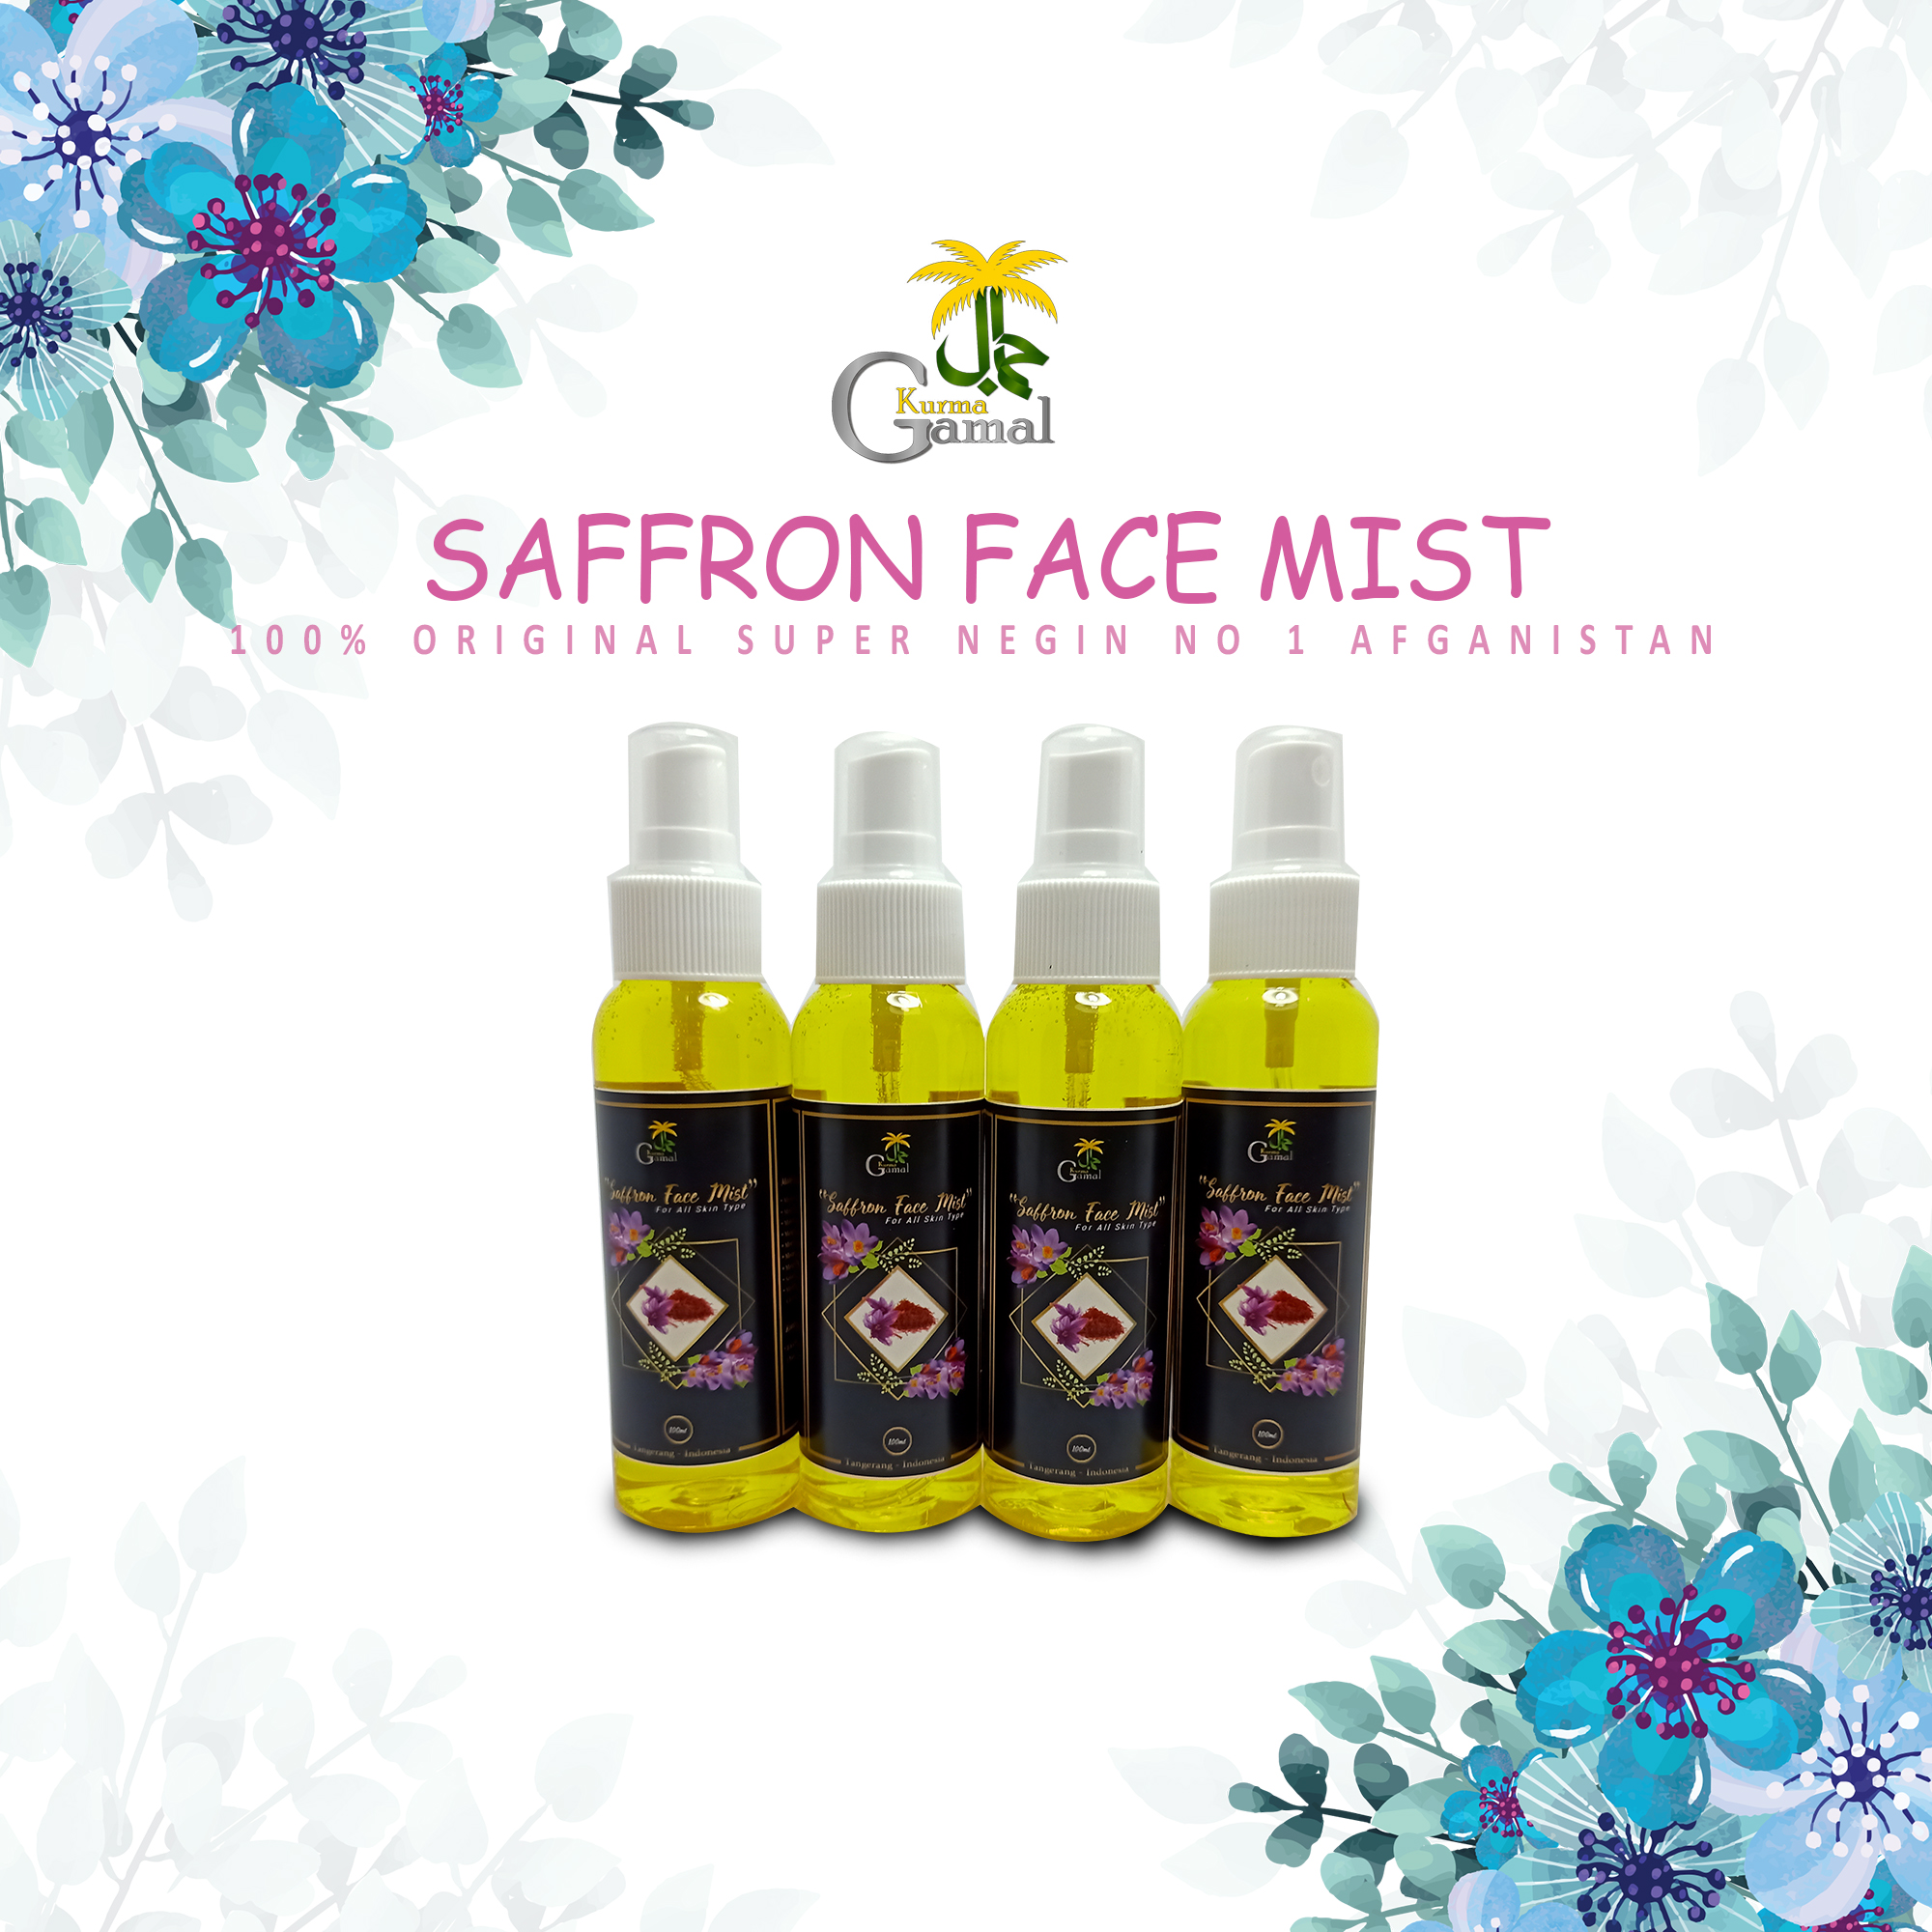 Face Mist Safron Original 100 Super Negin No 1 Afganistan Terbaru 2020 Lazada Indonesia